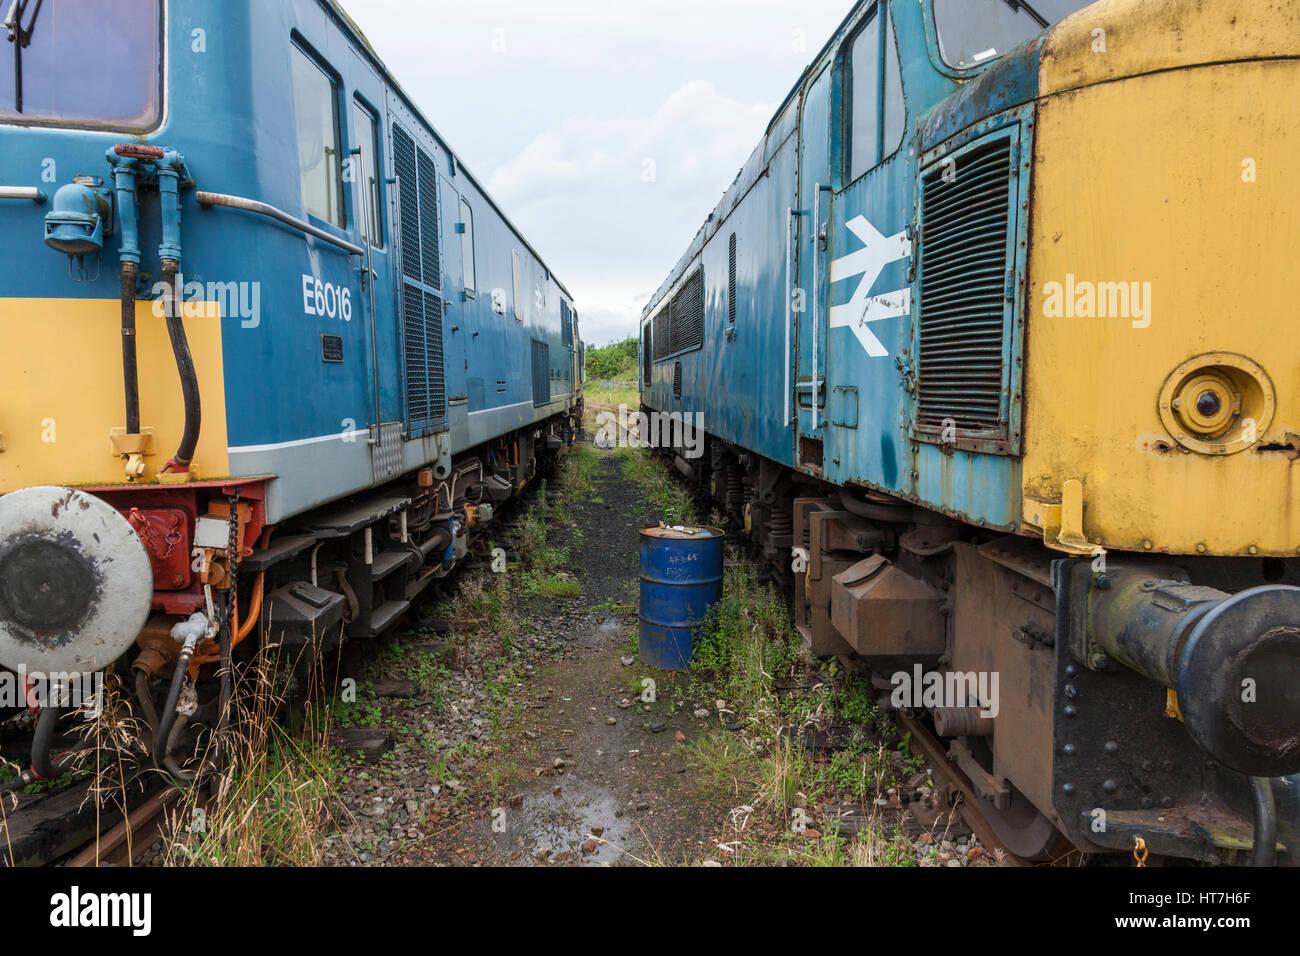 Between two old diesel locomotives awaiting restoration at Nottingham Transport Heritage Centre, England, UK Stock Photo